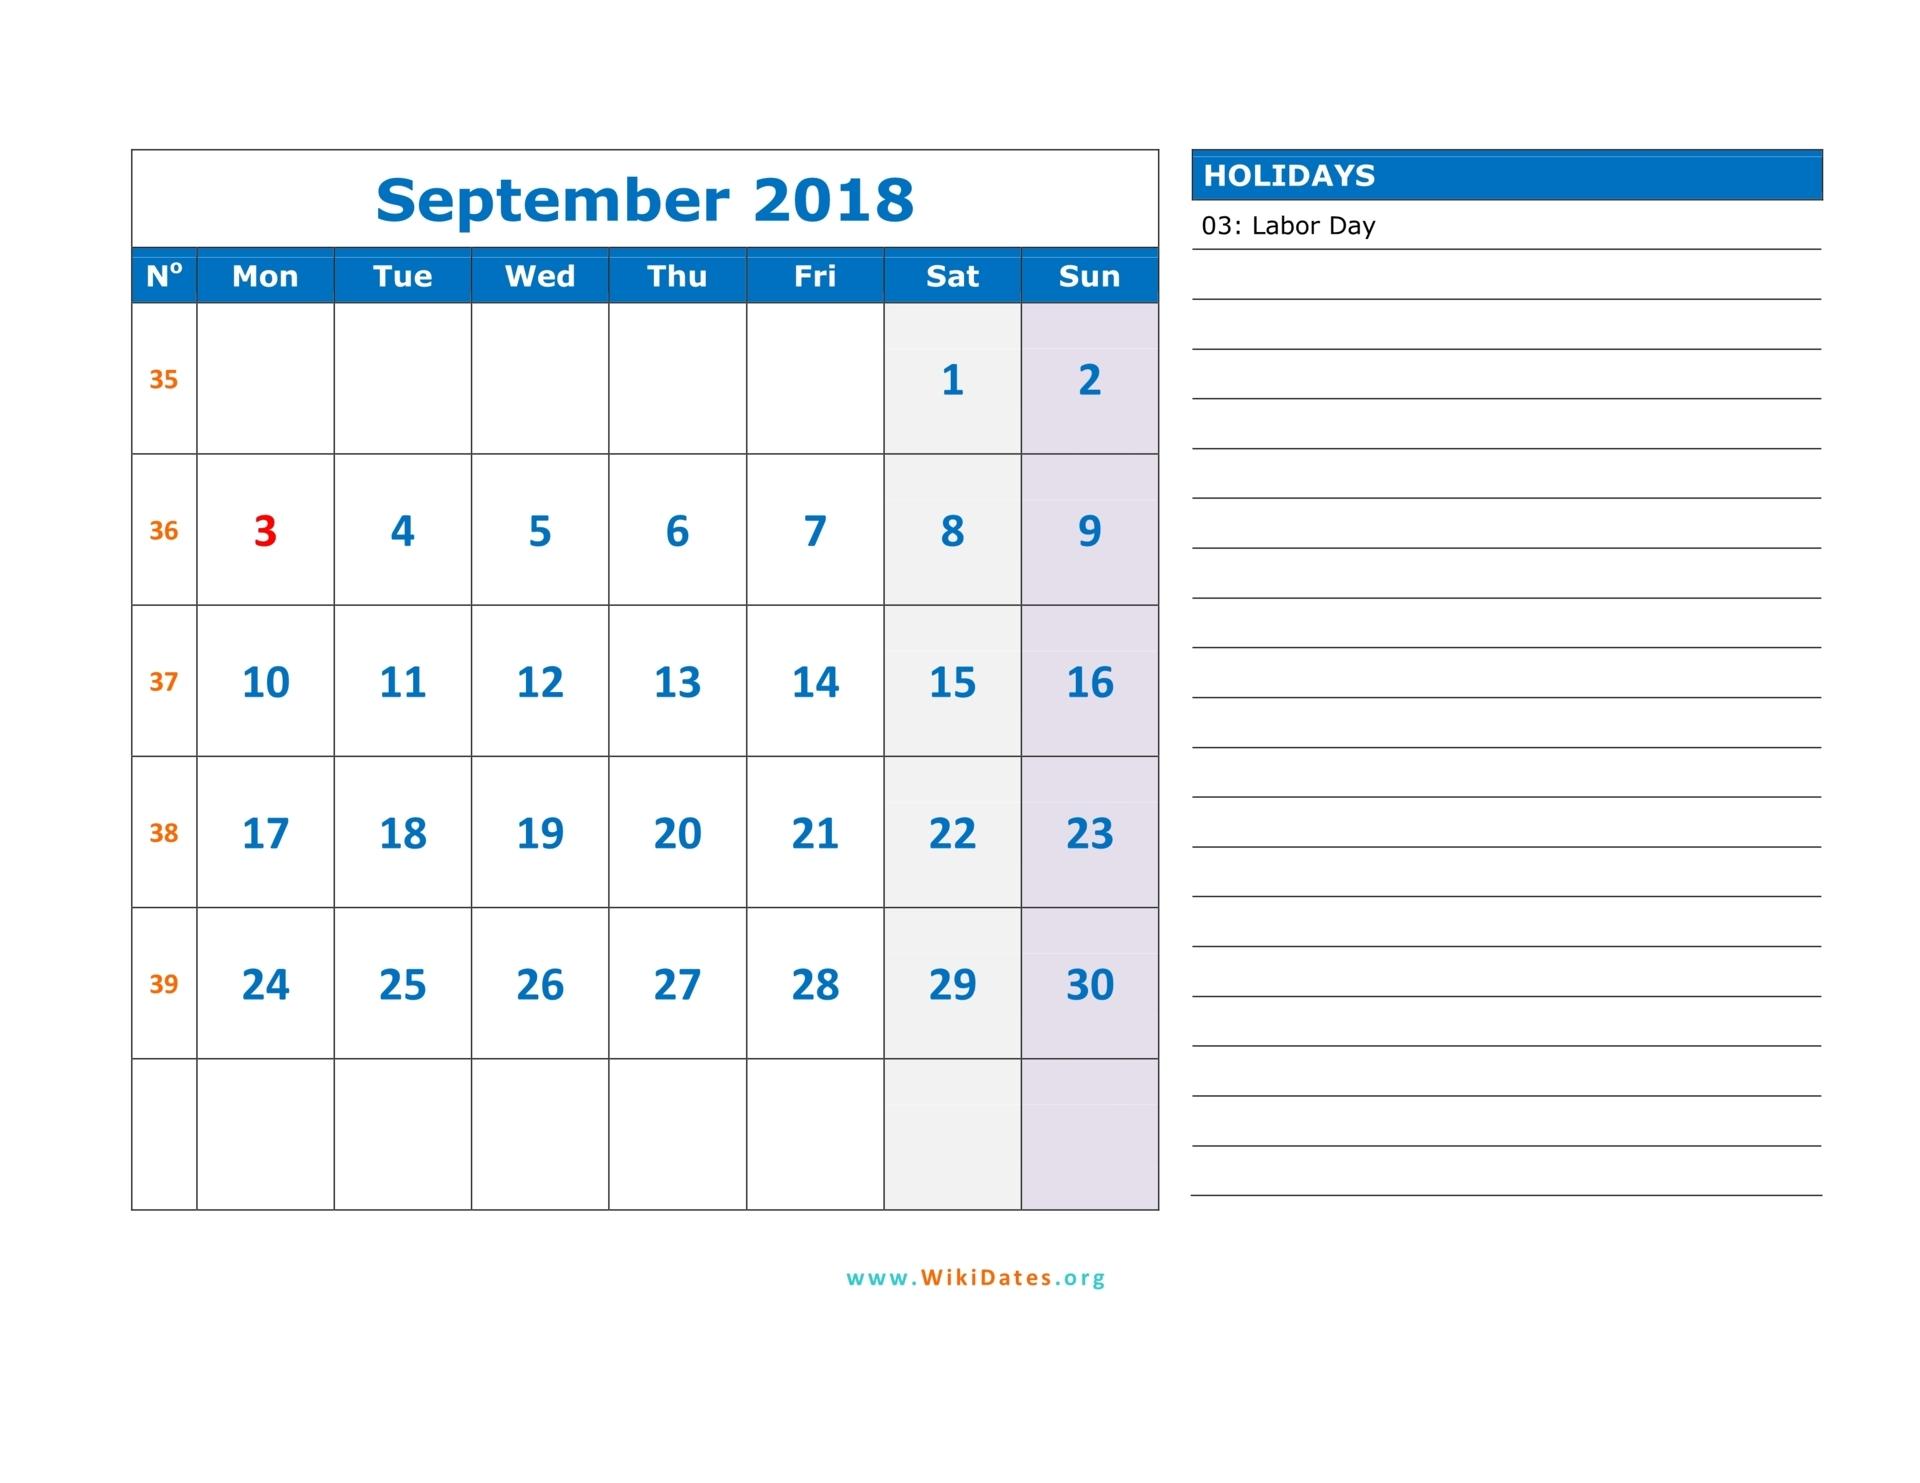 September 2018 Calendar WikiDates Org